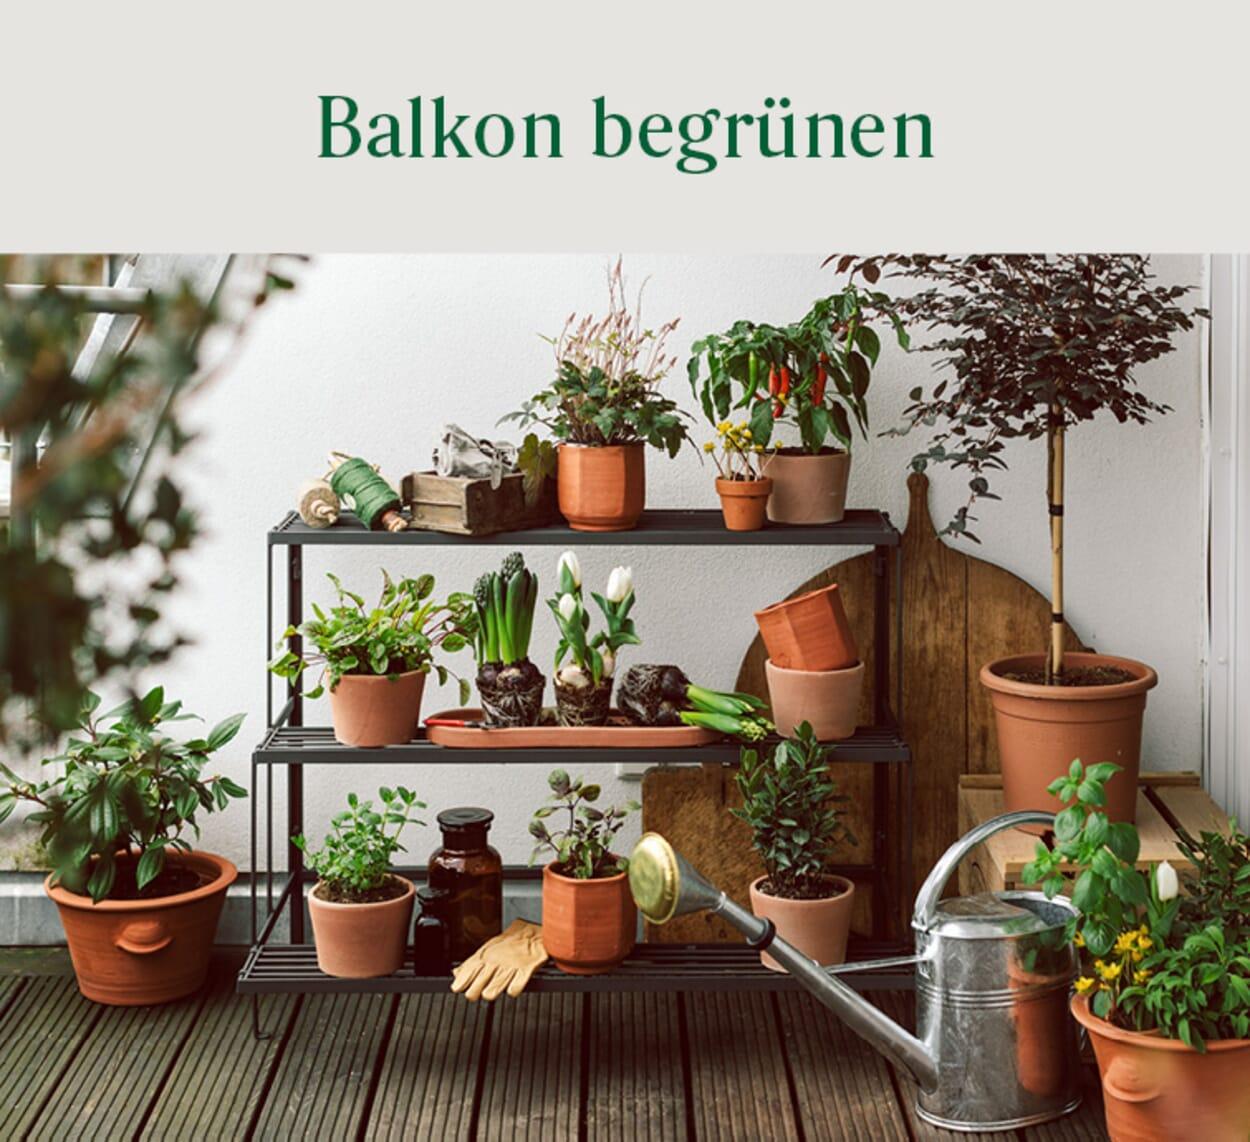 Balkon begrünen